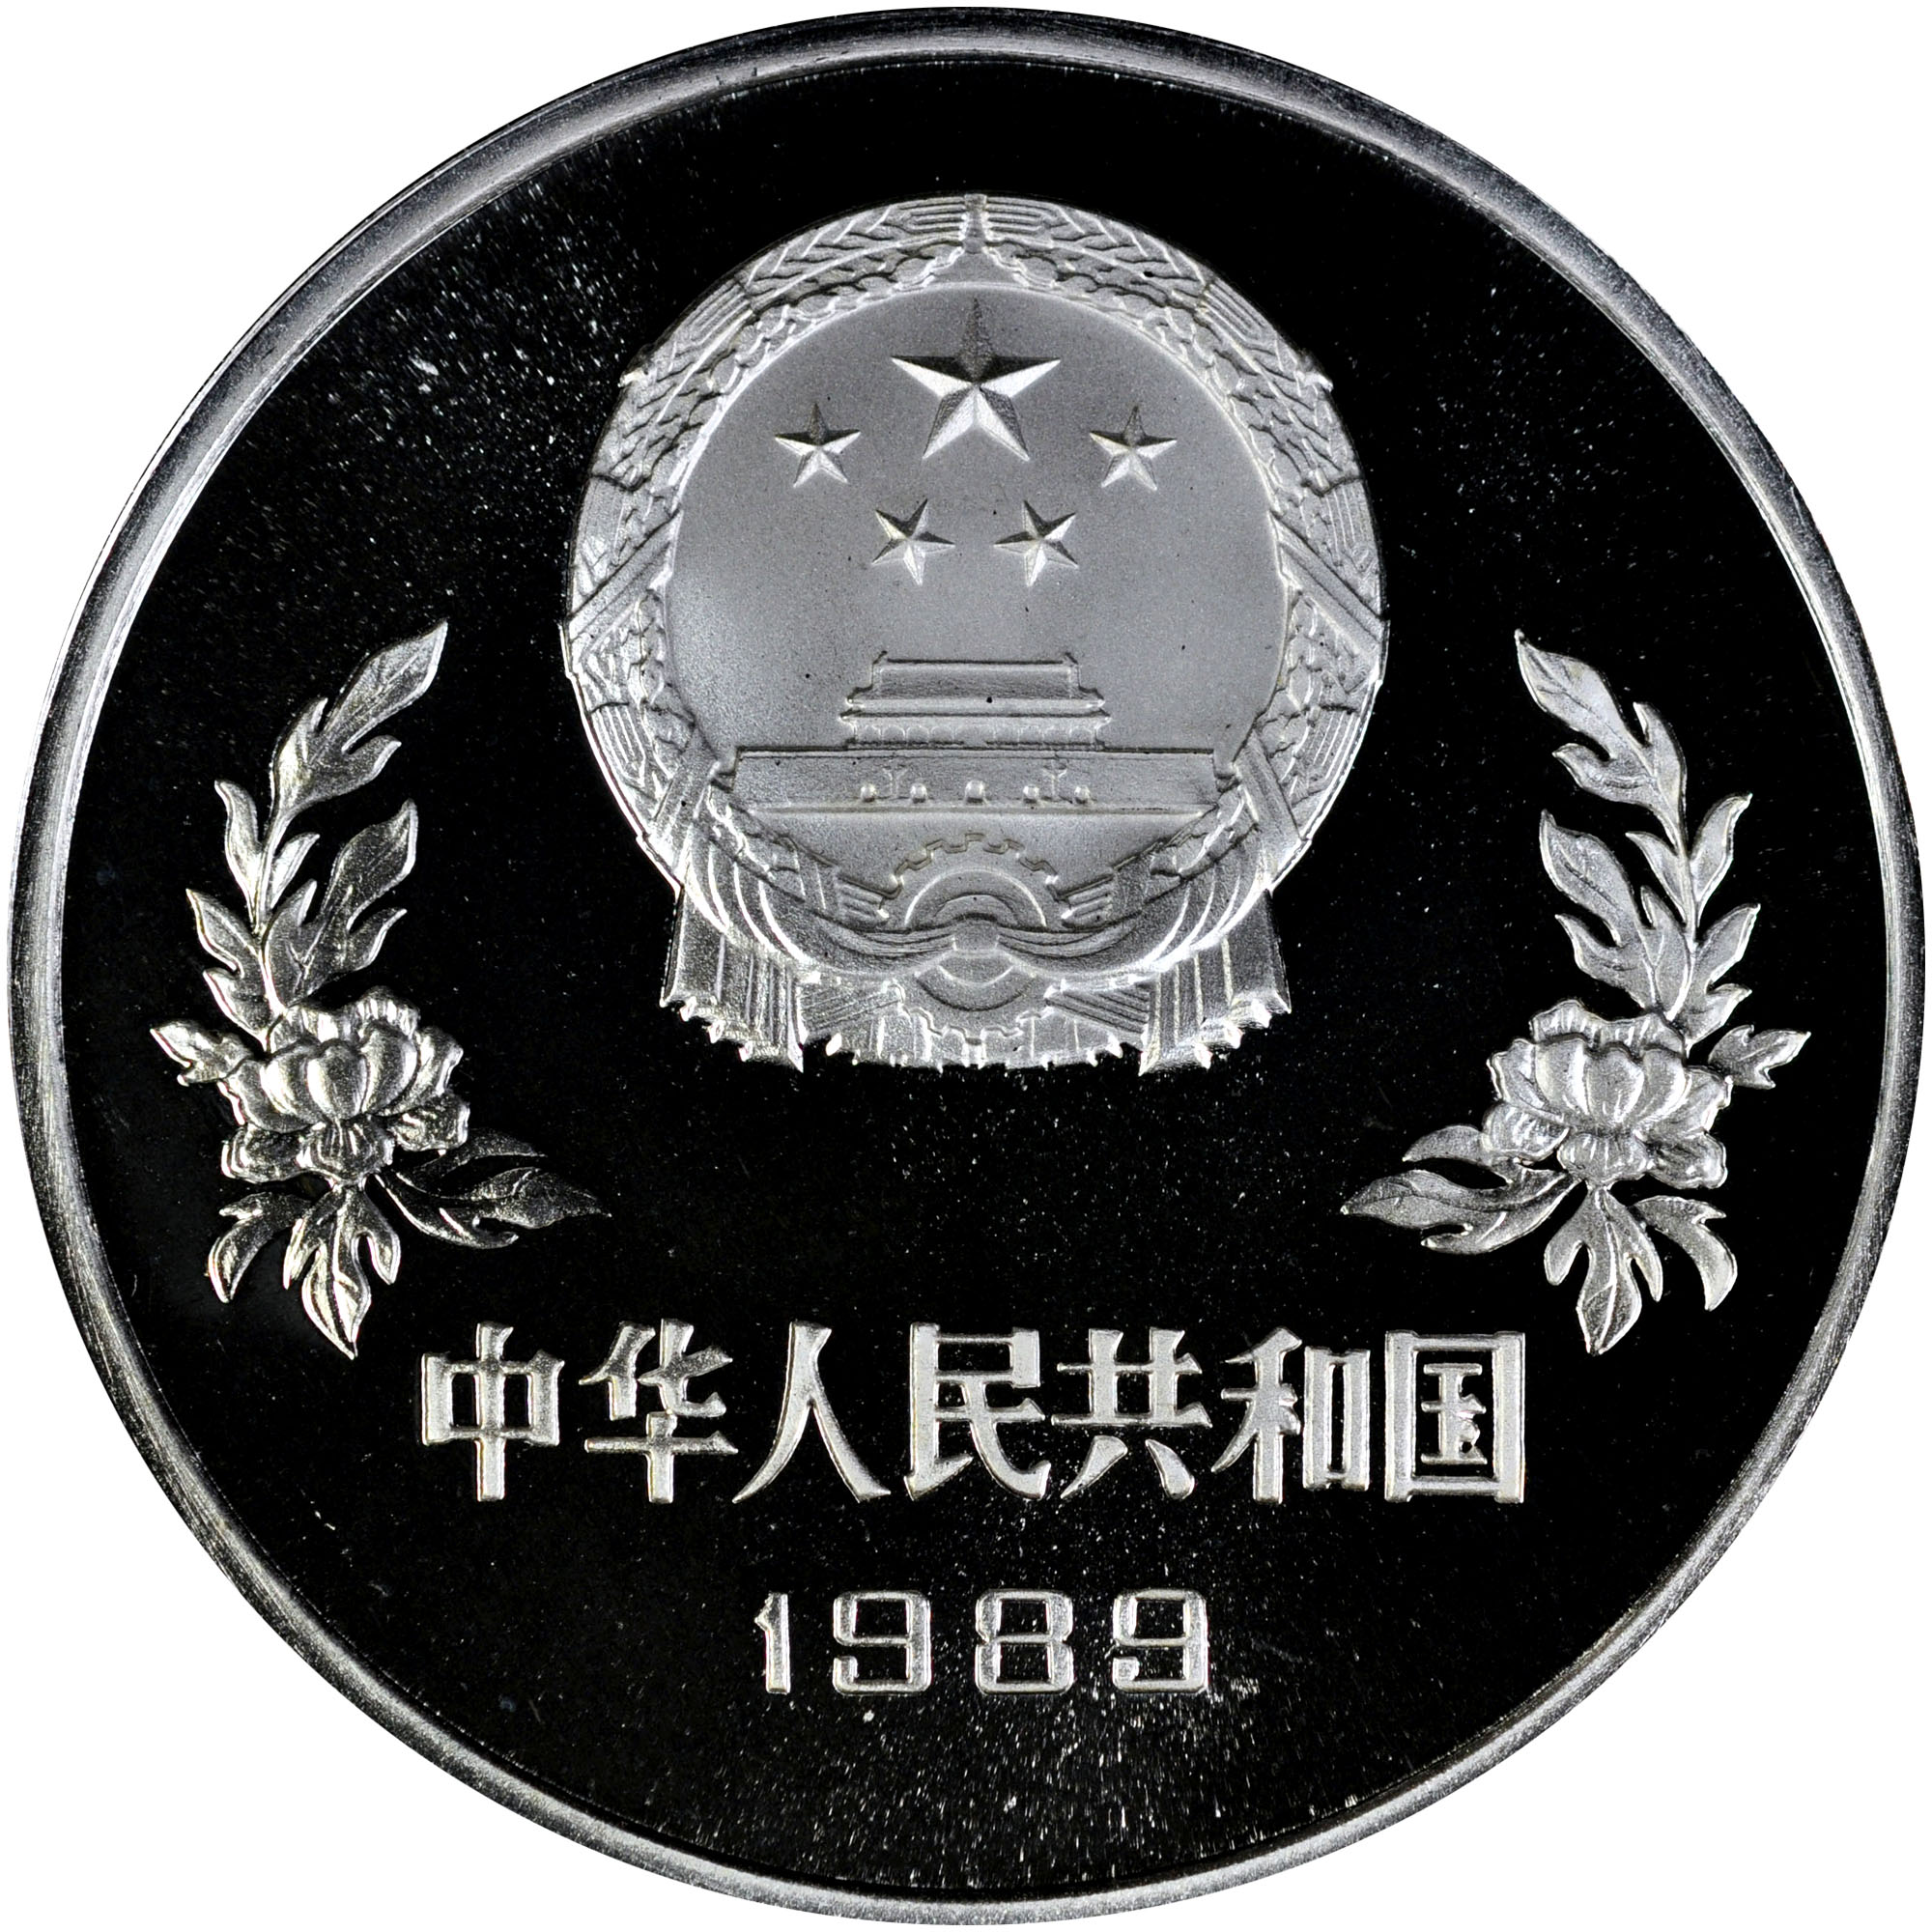 1989 China, People'S Republic 5 Yuan obverse